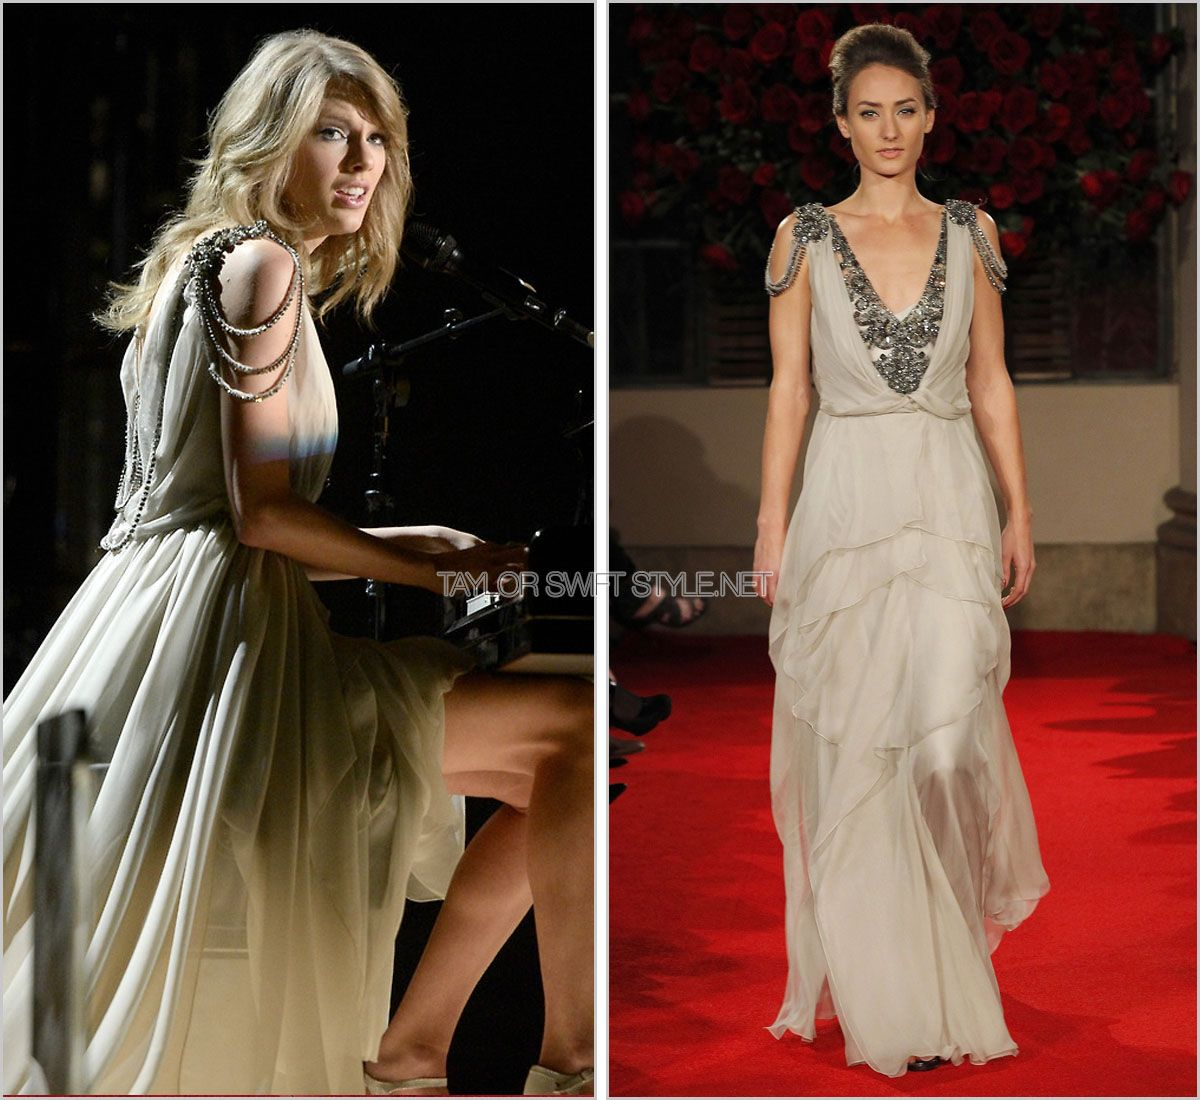 taylor swift style taylor swift fashion taylor swift